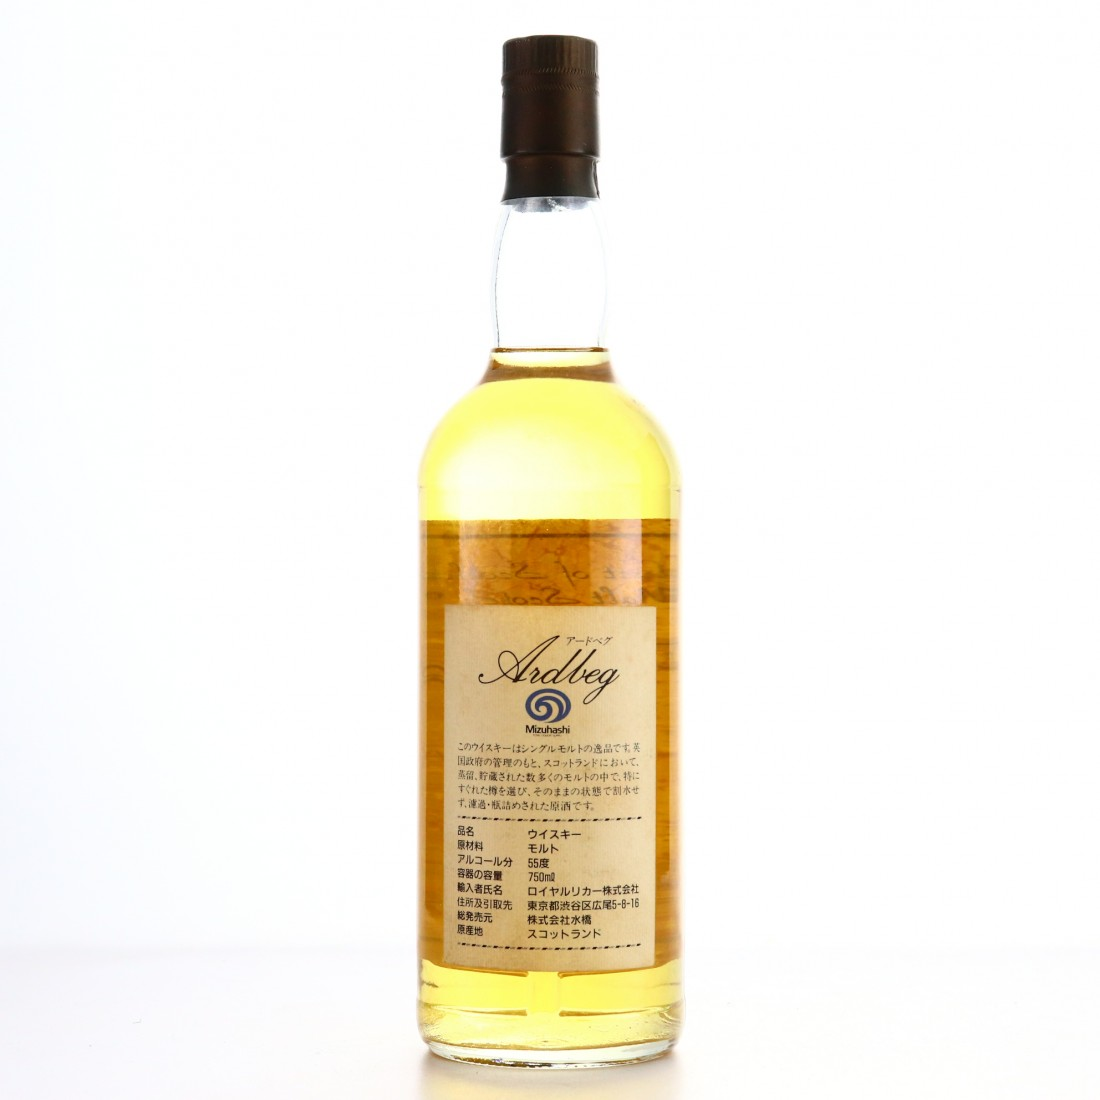 Ardbeg 1965 Cadenhead's 23 Year Old / Mizuhashi Total Liquor Supply